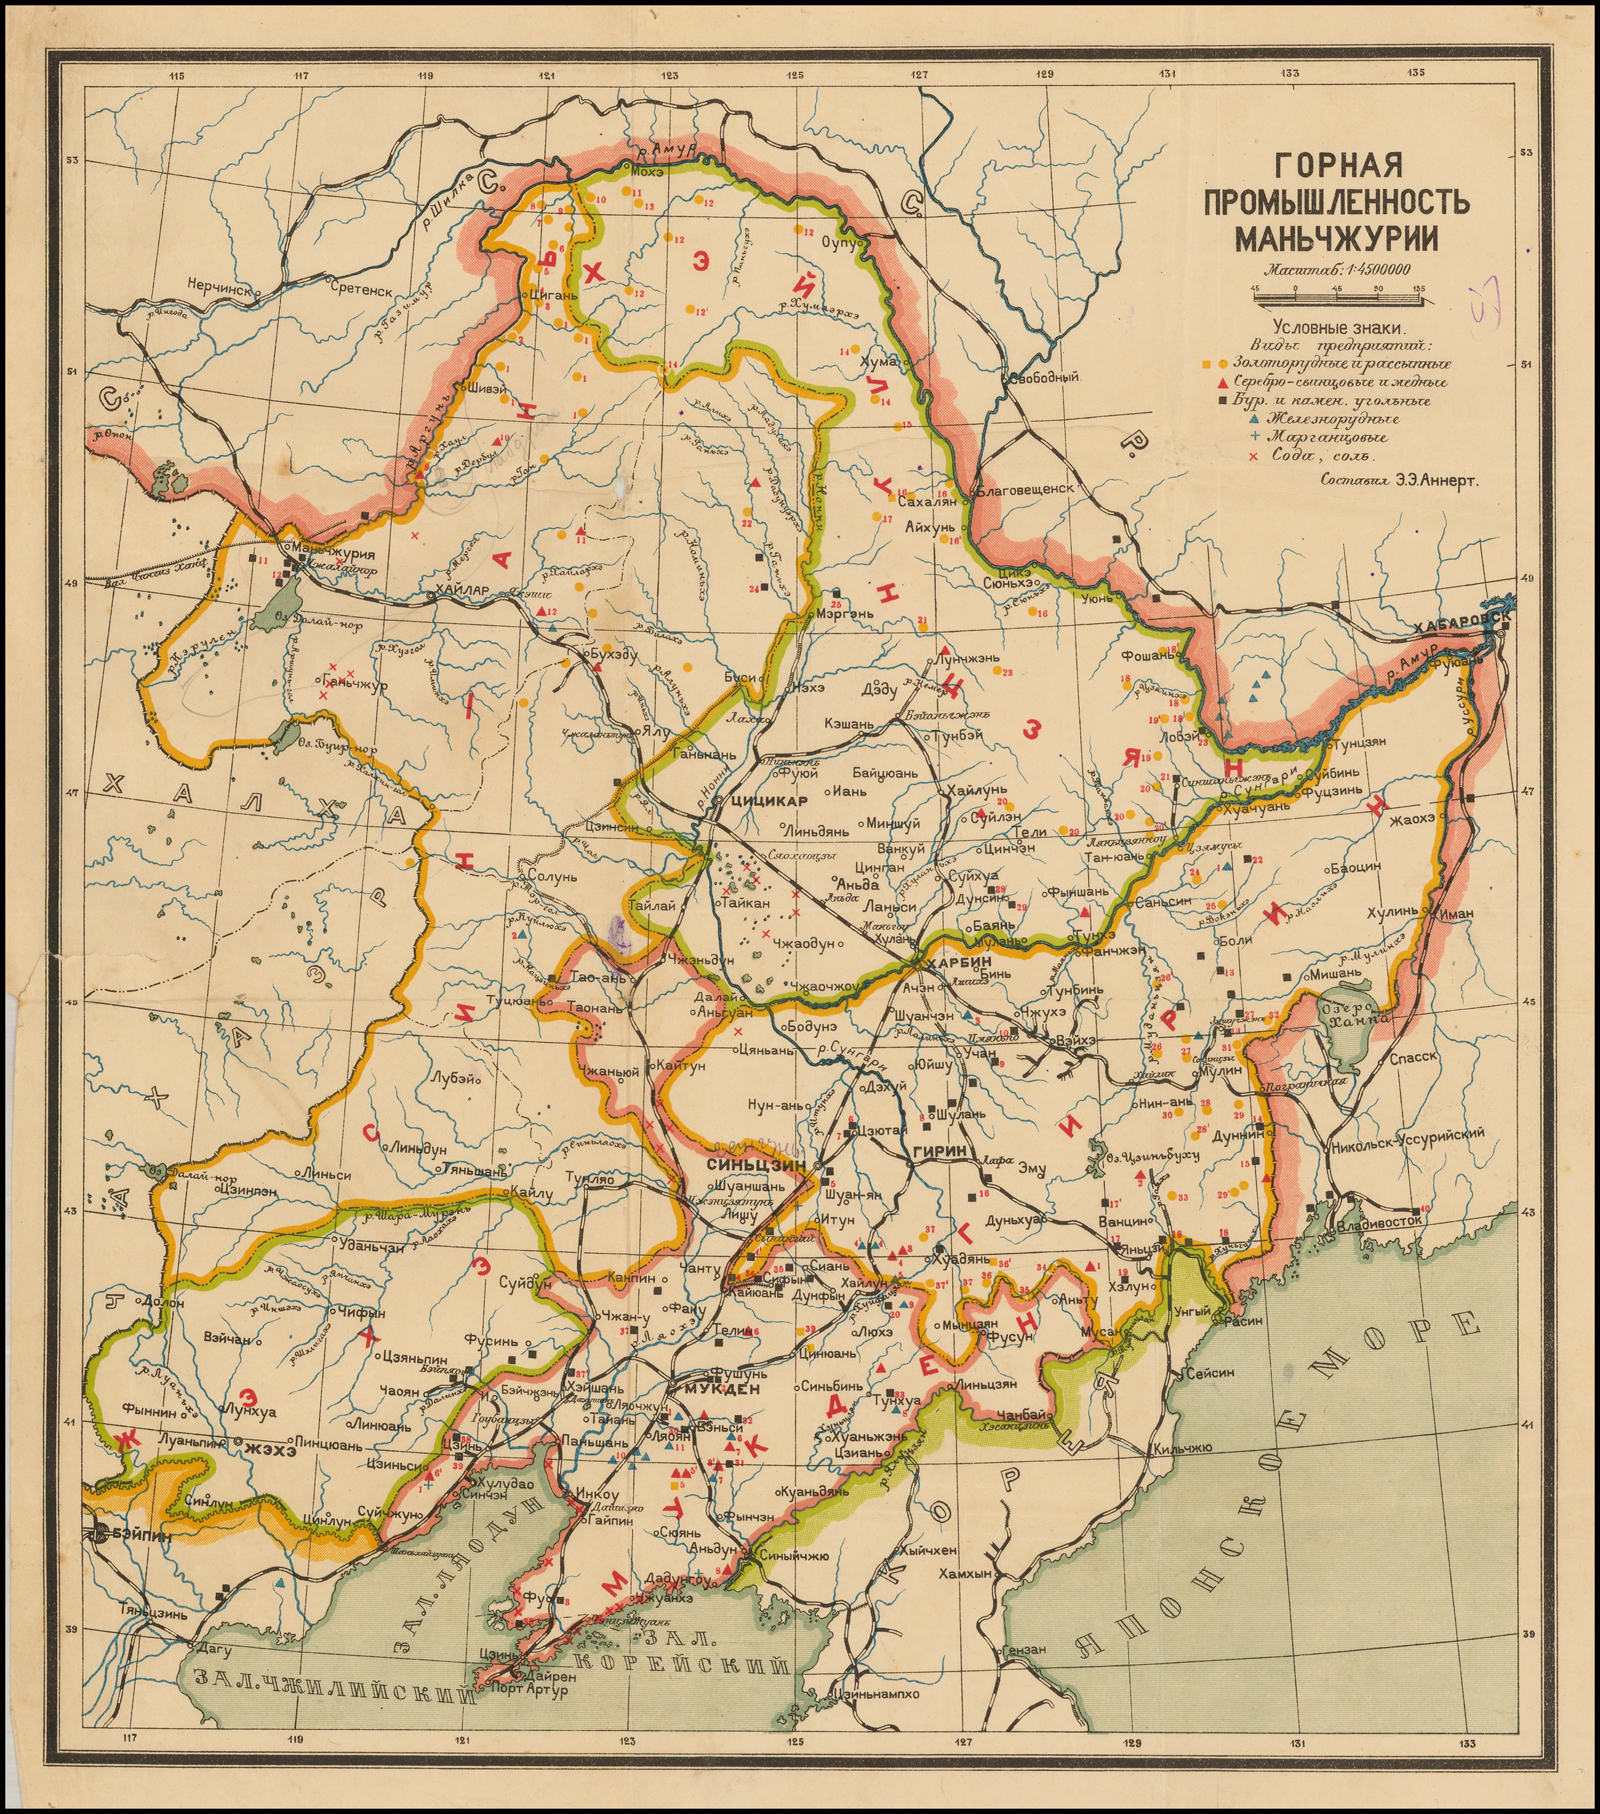 Manchuria Mining Industry) ГОРНАЯ ПРОМЫШЛЕННОСТь on persia map, nanking massacre, hainan map, sweden map, empire of japan, russo-japanese war, kazakhstan map, gobi desert map, new guinea map, shenyang map, austria map, asia map, great wall of china, second sino-japanese war, beijing map, first sino-japanese war, ming dynasty, inner mongolia, formosa map, china map, pakistan map, xinjiang map, sakhalin map, pearl harbor map, abyssinia map, angola map, qing dynasty, great wall map, japanese invasion of manchuria, nicaragua map,